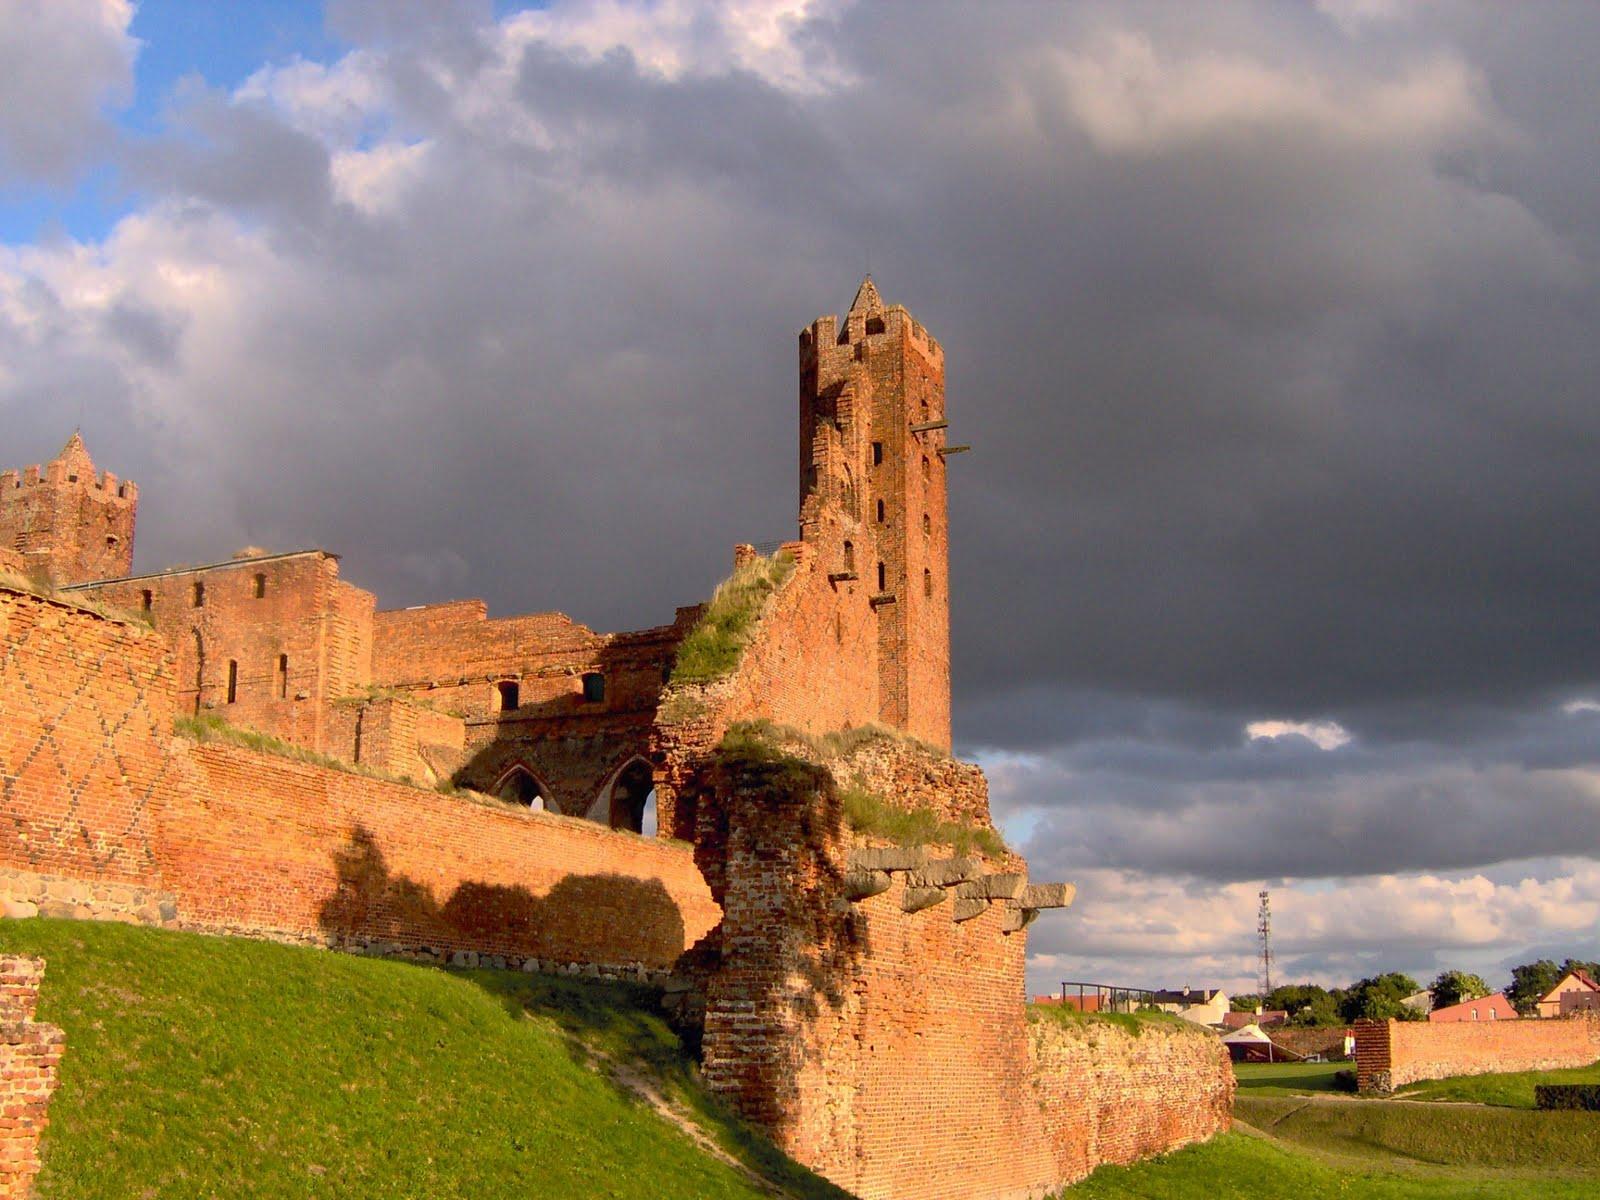 http://2.bp.blogspot.com/-l0XbRD0QNqU/TZW_lOb3toI/AAAAAAAABoI/Utb6fzYdLaA/s1600/castle_ruins-1920x1440.jpg